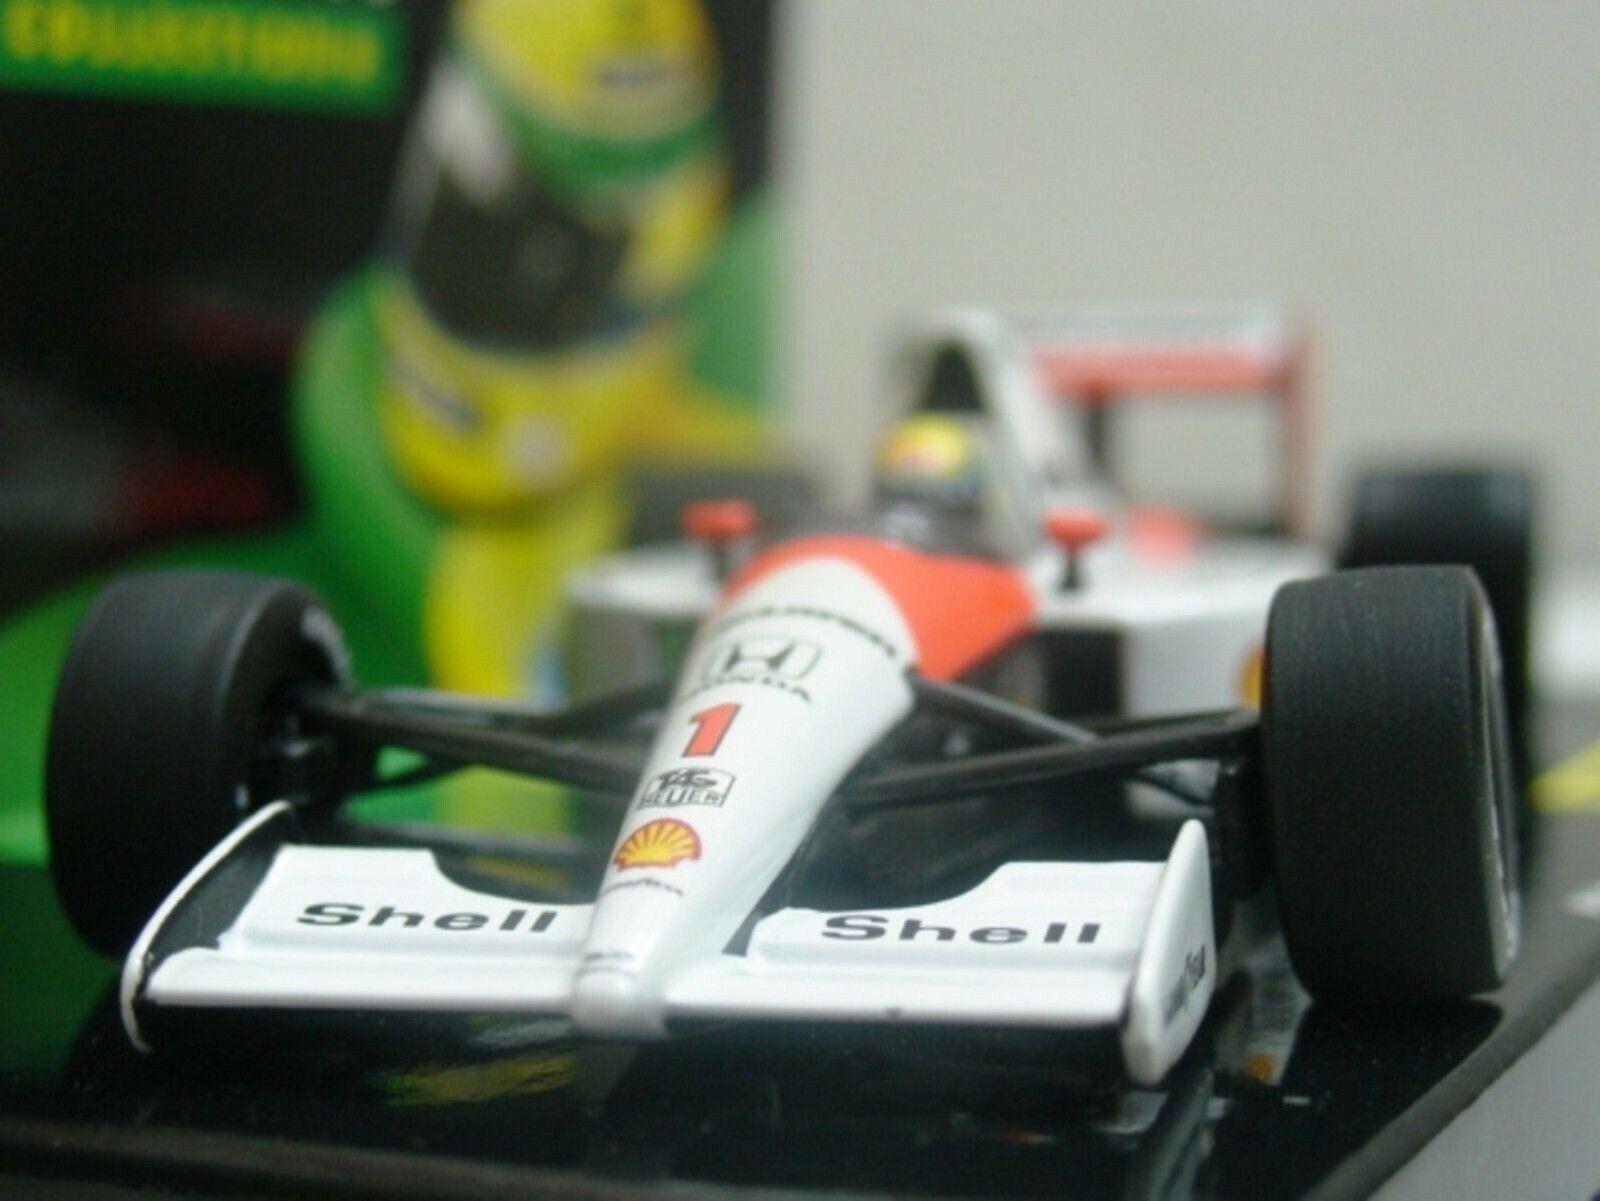 WOW EXTREMELY RARE McLaren 1991 MP4 6 Honda Senna GP Hockenheim 1 43 Minichamps